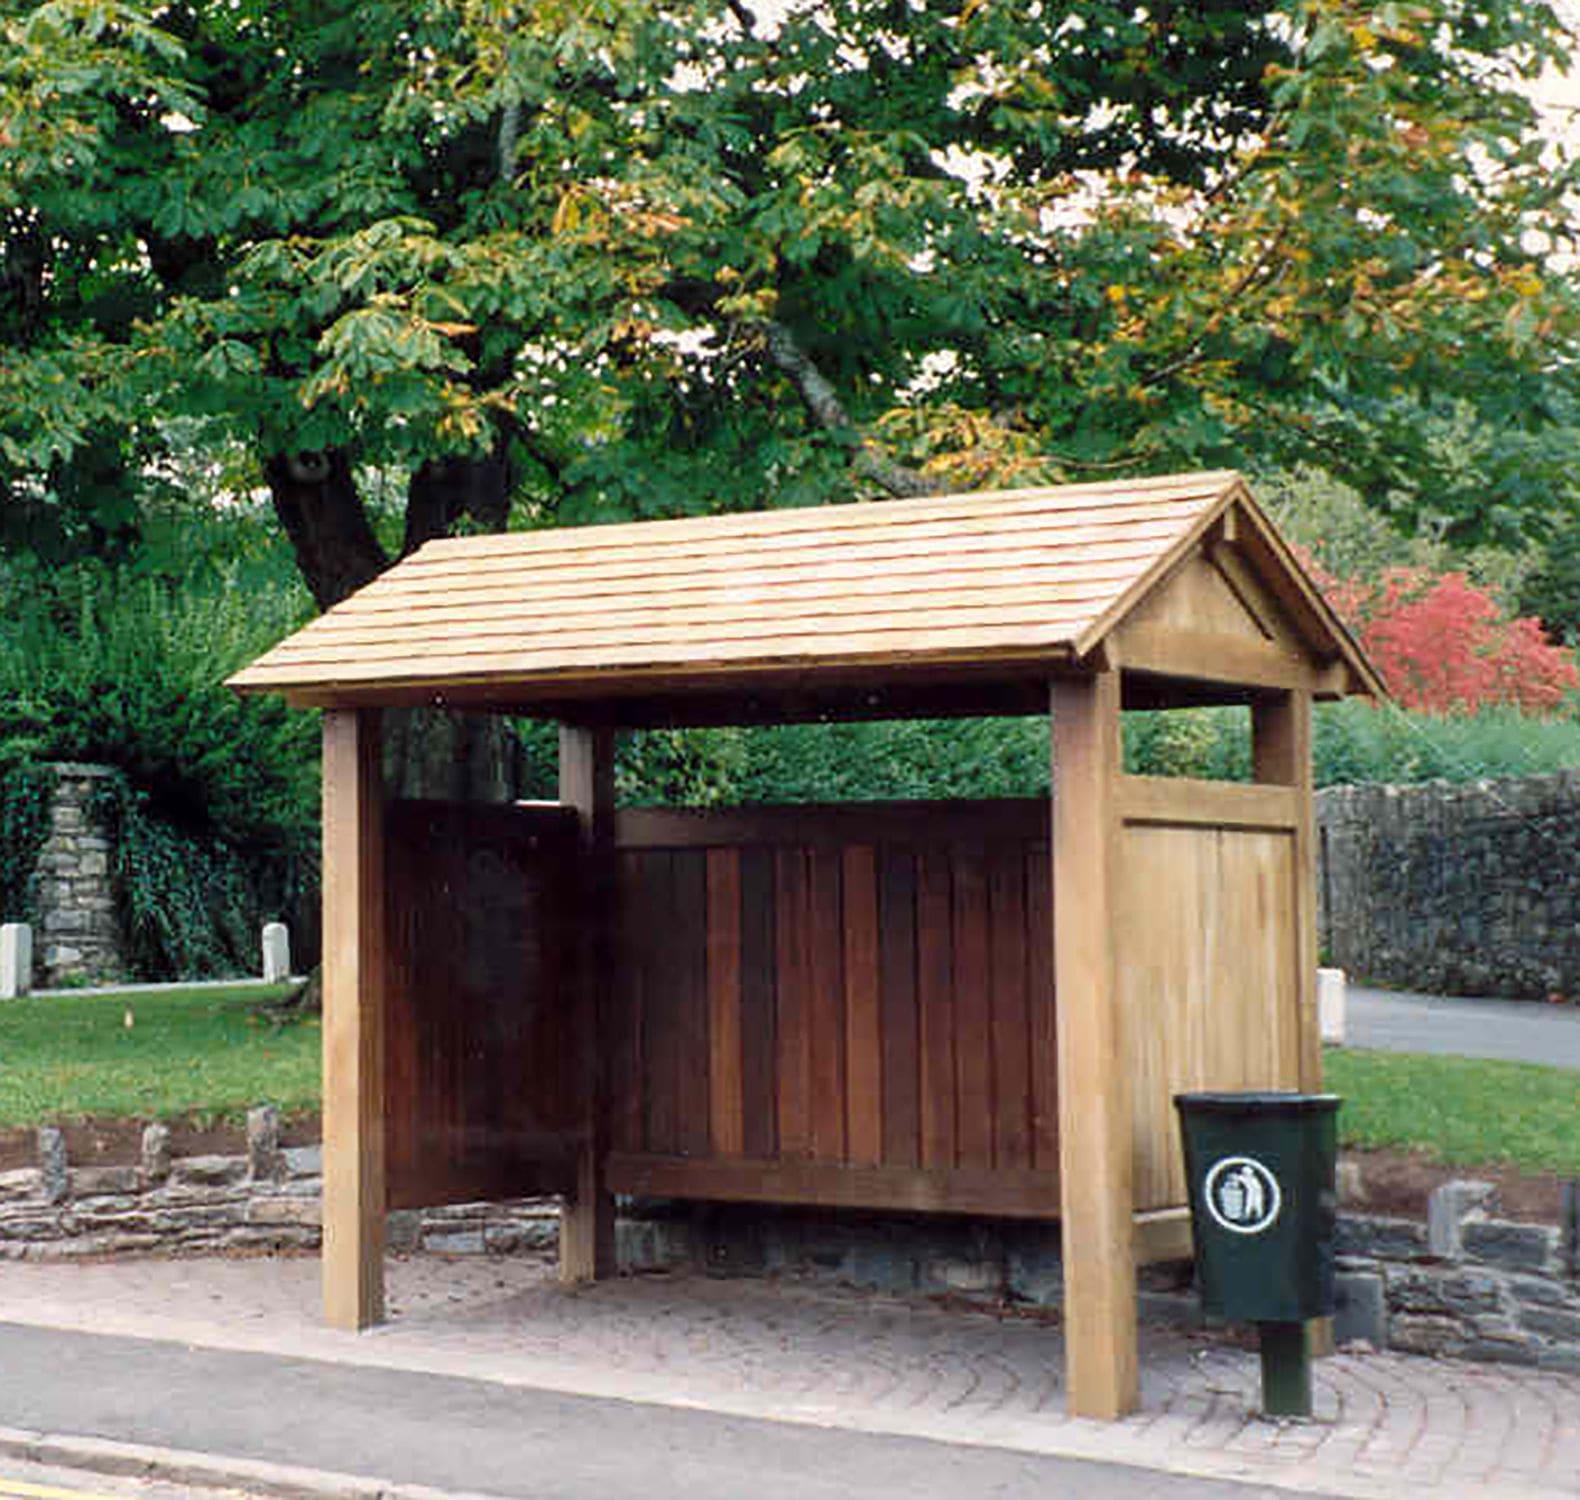 Wooden bus shelter - STANDARD - Woodscape.